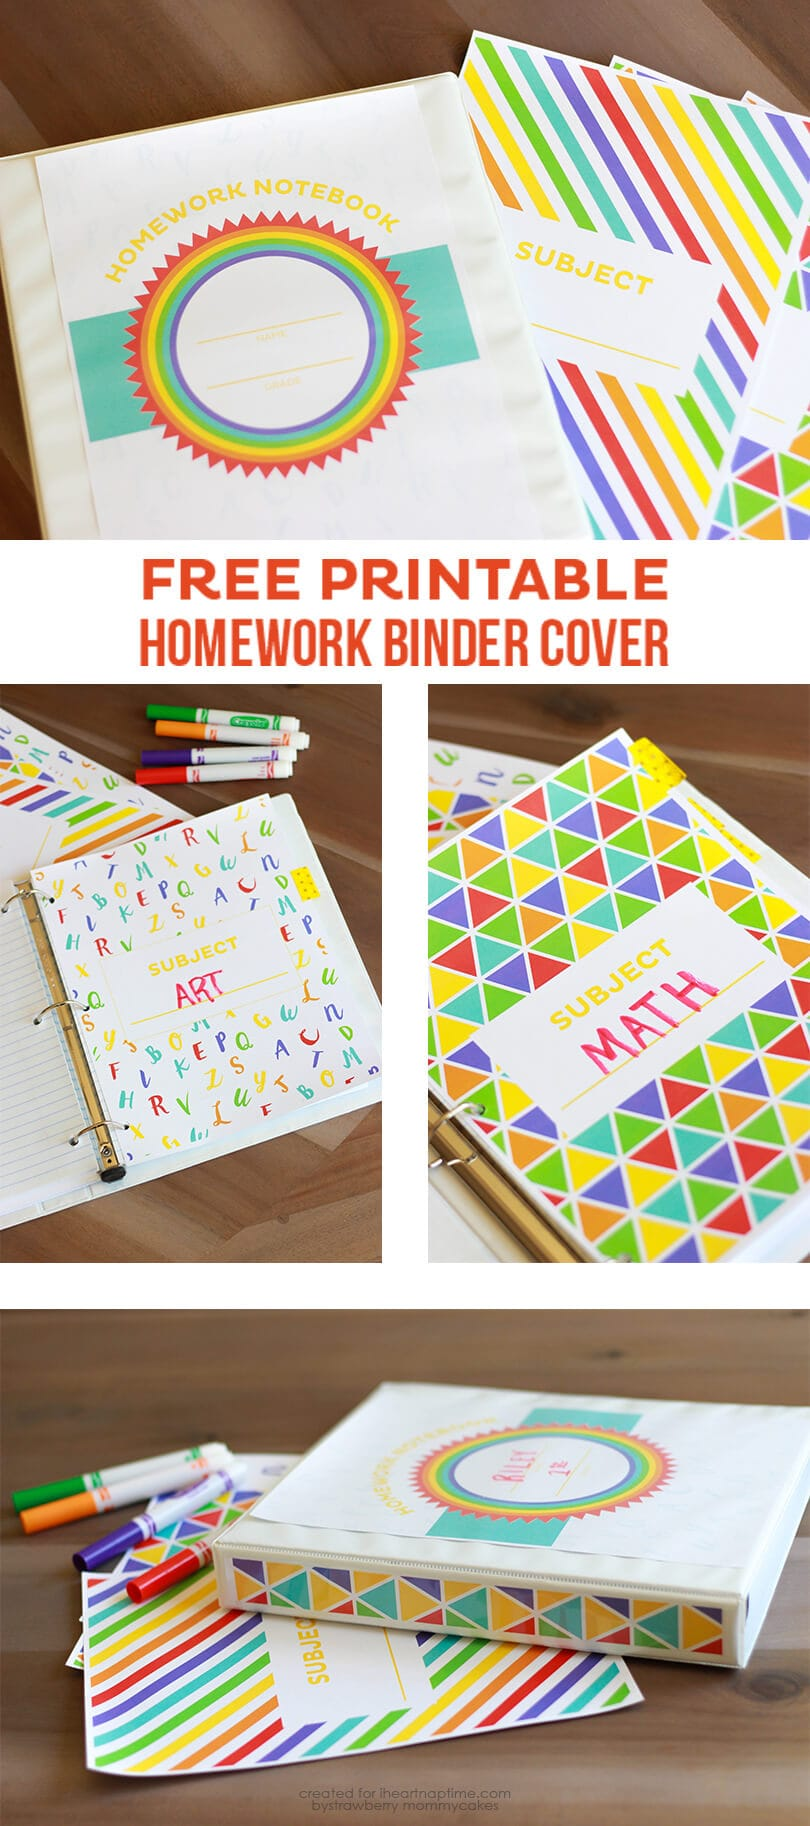 Keep your kids' homework organized with this FREE Printable Homework Binder Cover on iheartnaptime.com